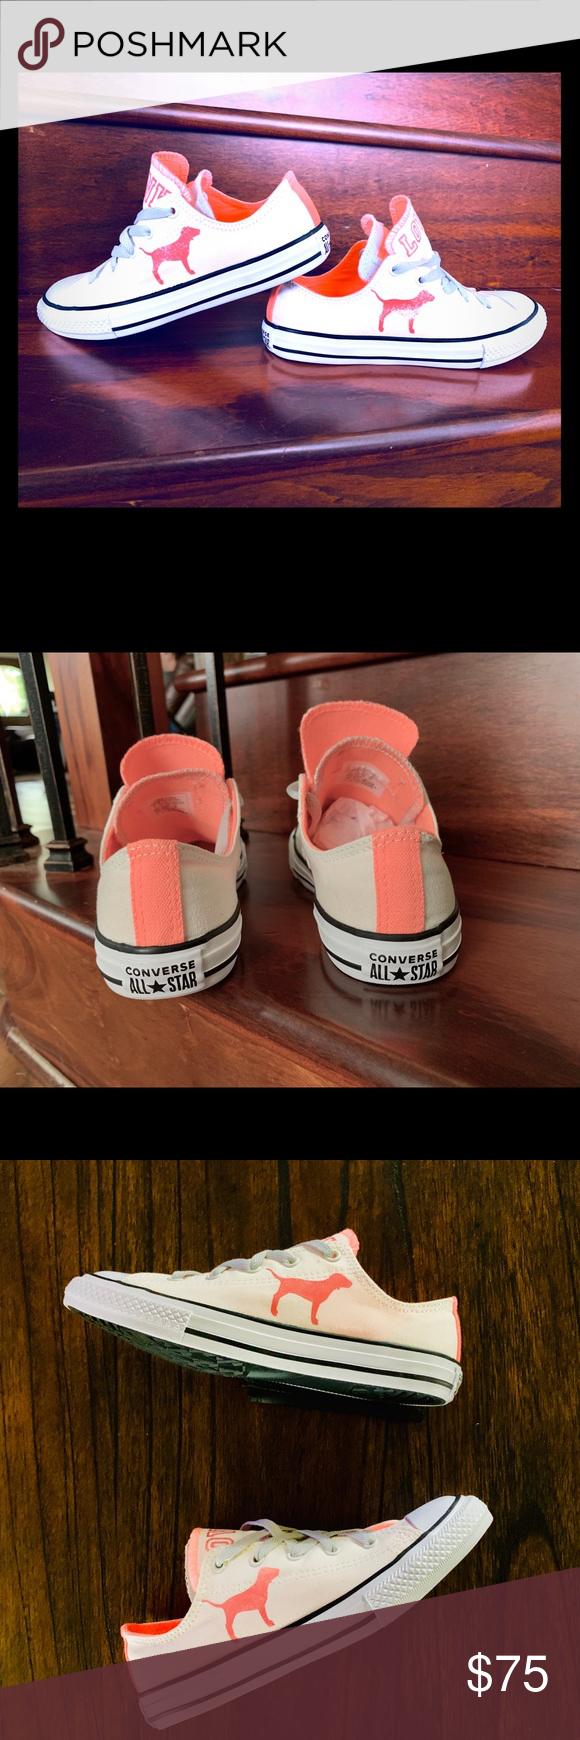 ffab15d281e5d Converse pink Victoria's Secret shoe, new, size 6 Converse all-star ...